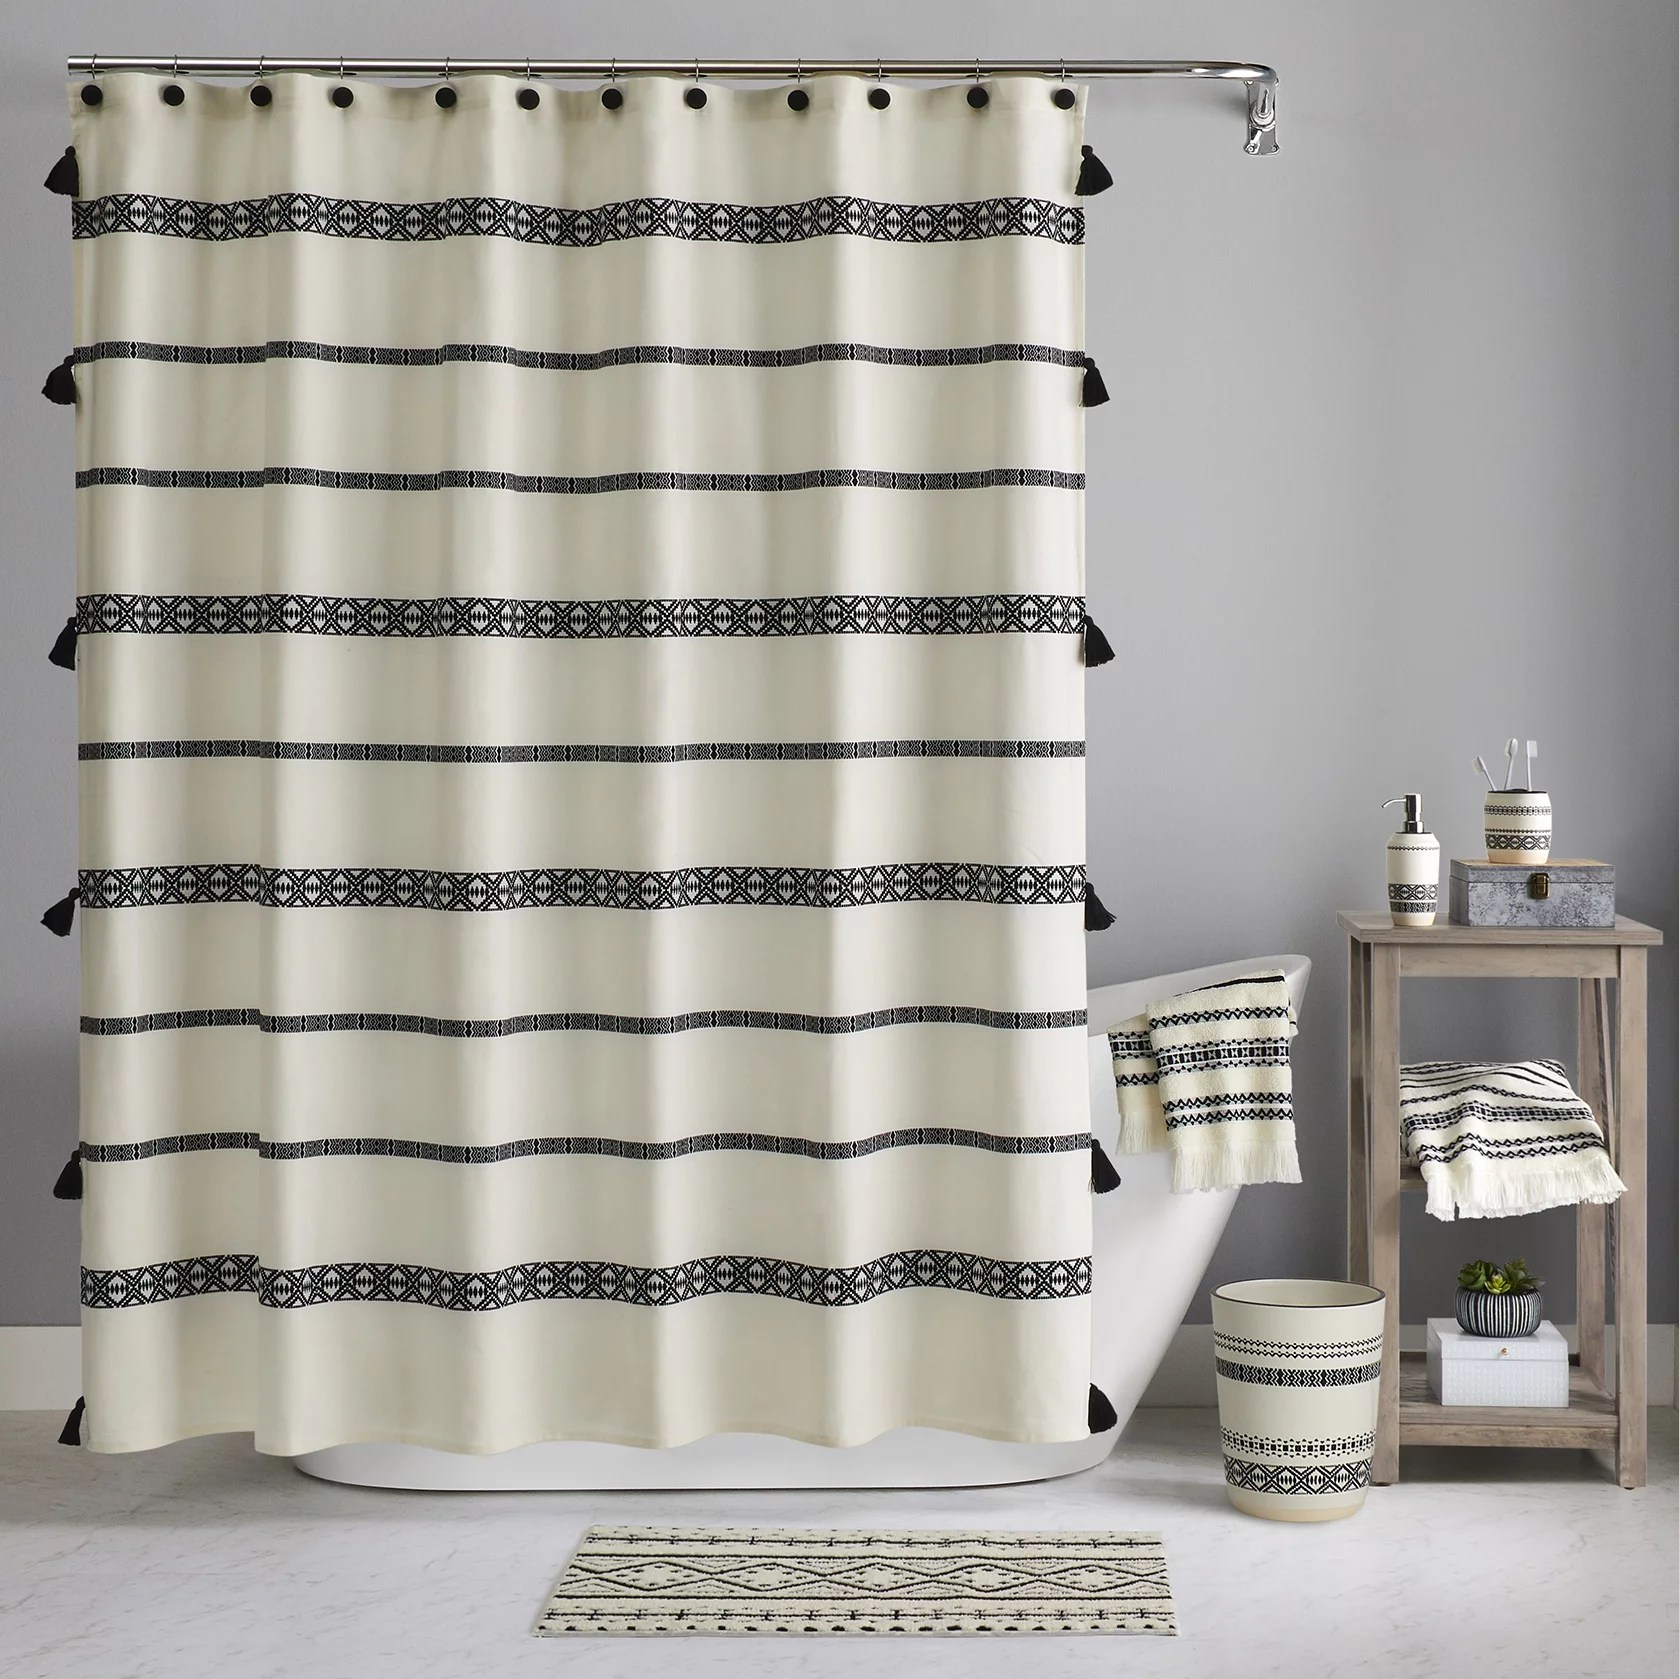 better homes gardens boho chic cotton shower curtain beige black 72 x72